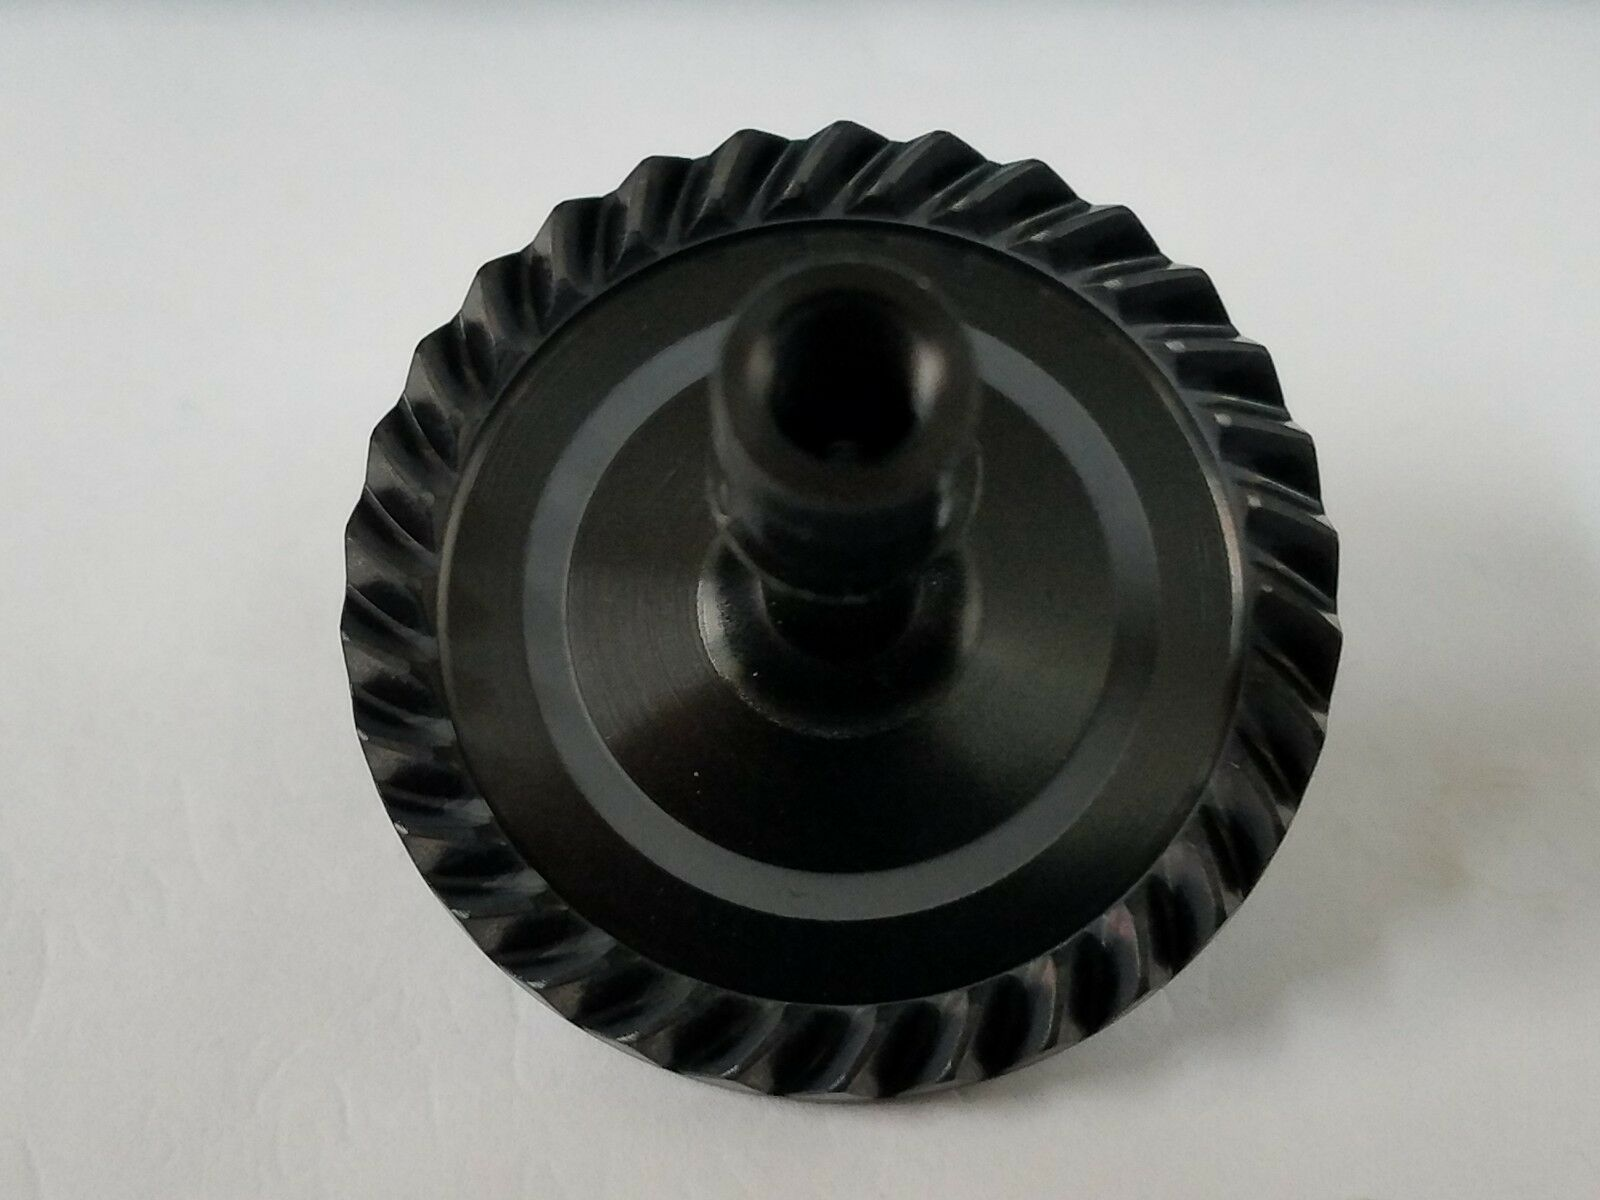 1 Shimano PartRD 11975 Drive Gear Fits ARTC-10000XSC ...